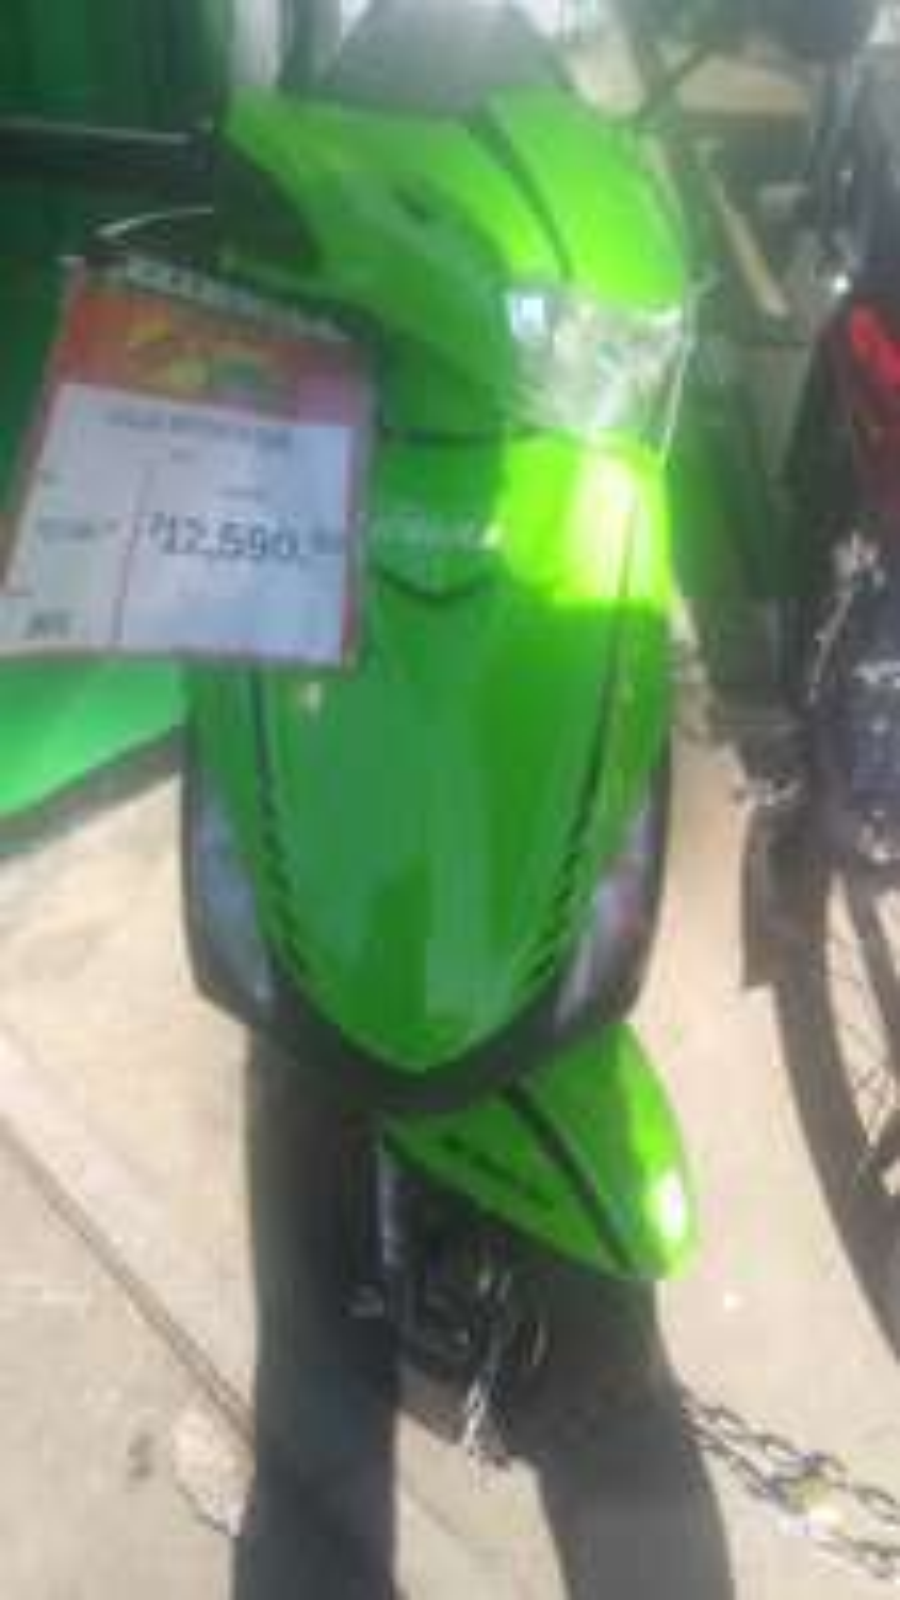 Aurrera Fco Montejo Merida, moto italika 125 verdeAurrera Fco Montejo Merida, moto italika verde